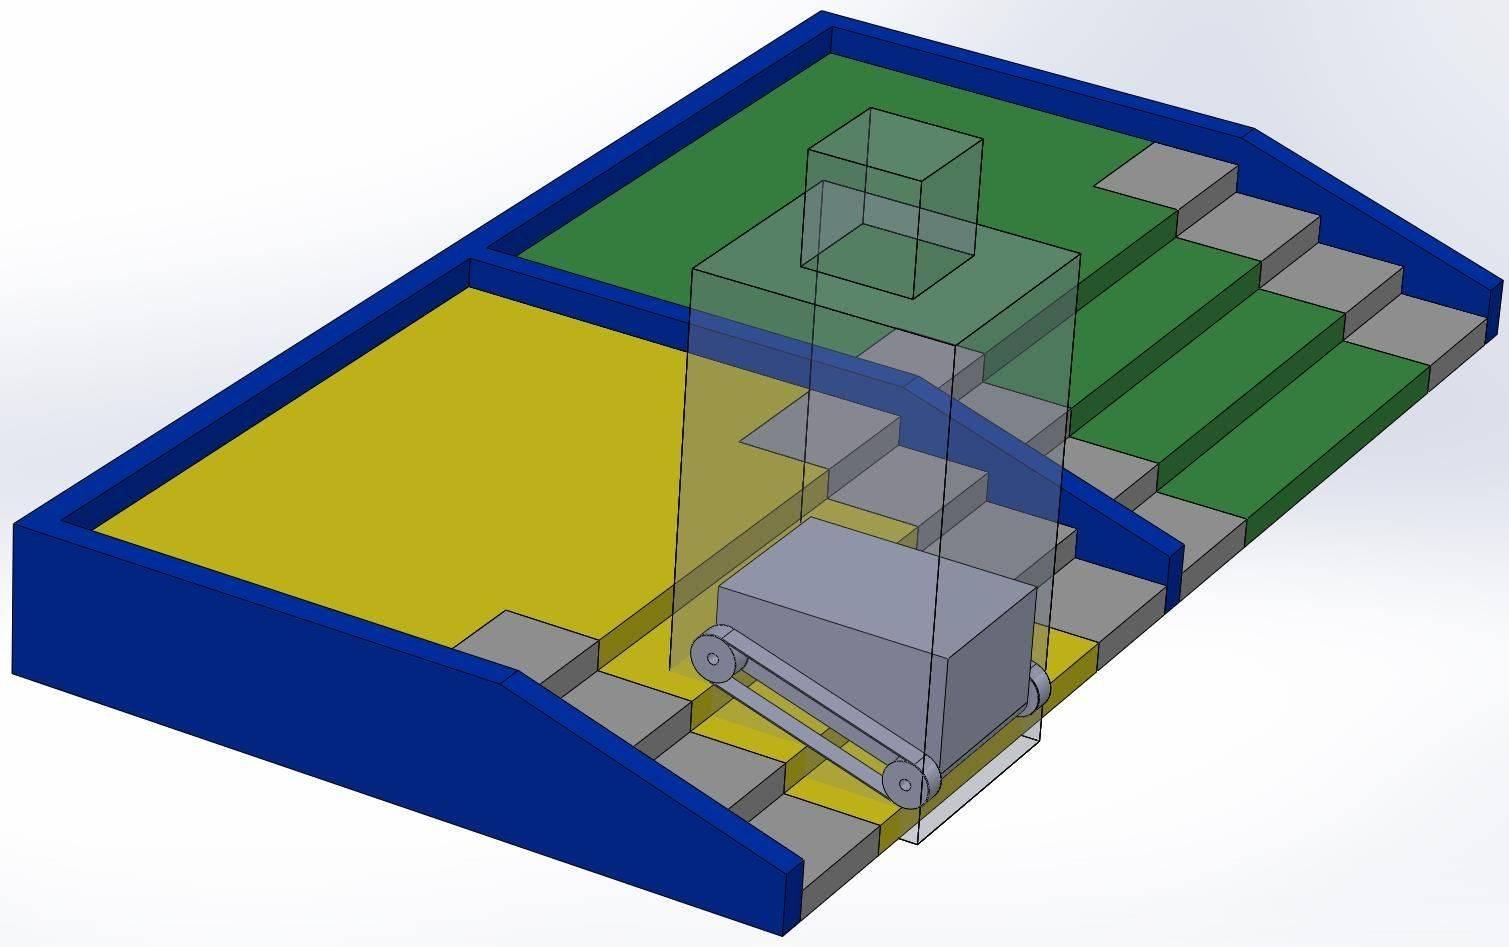 PR2015 - vue générale 01.jpg